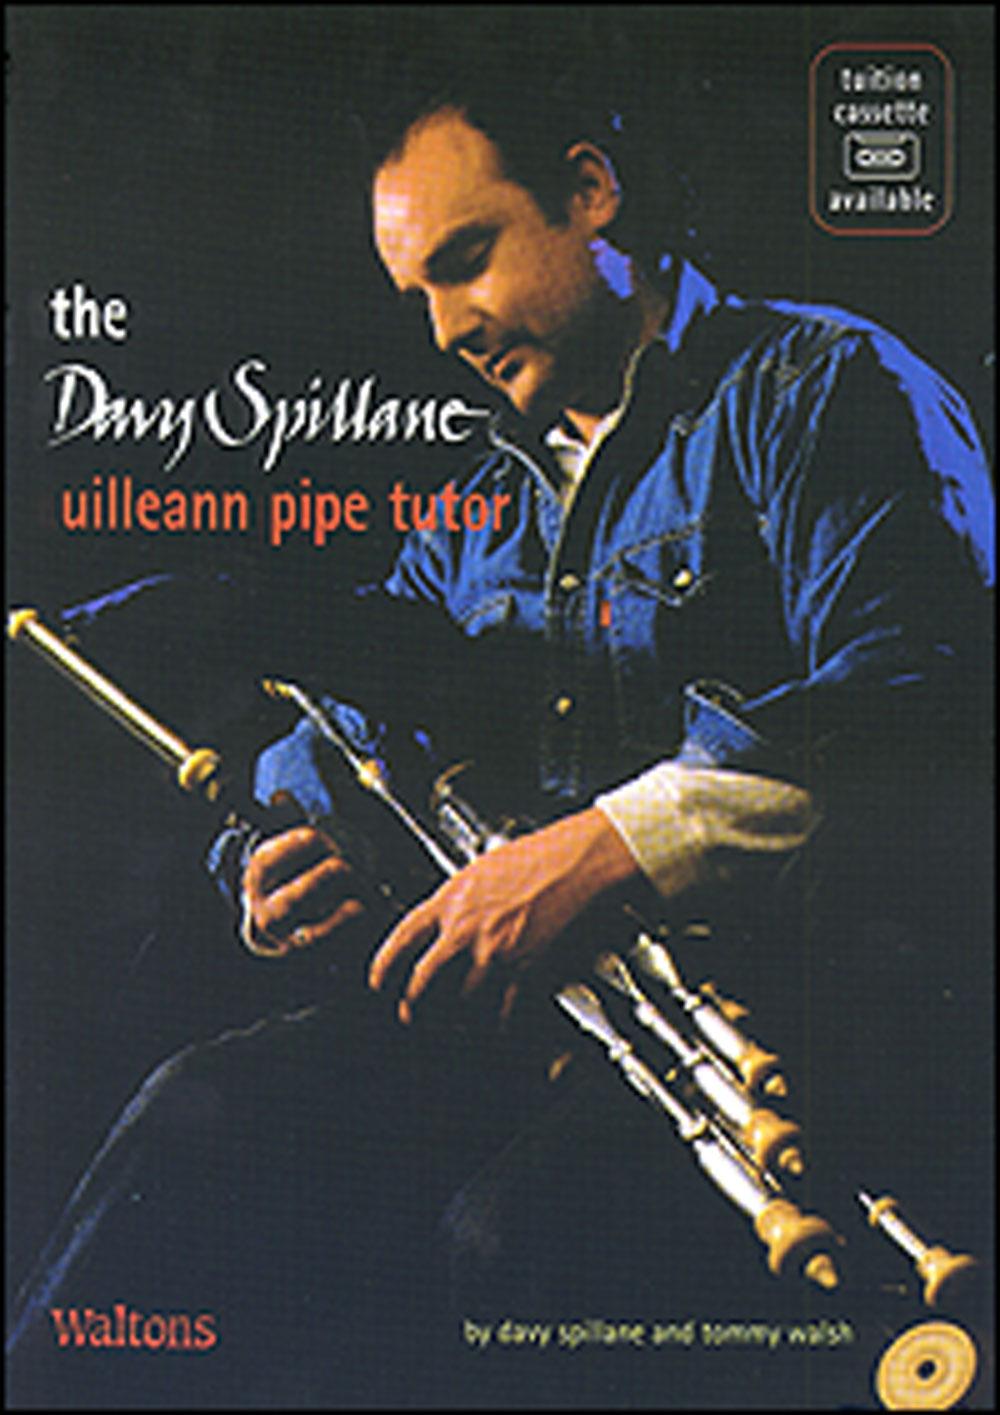 Davy Spillane Uilleann Pipe Tutor - Bagpipes